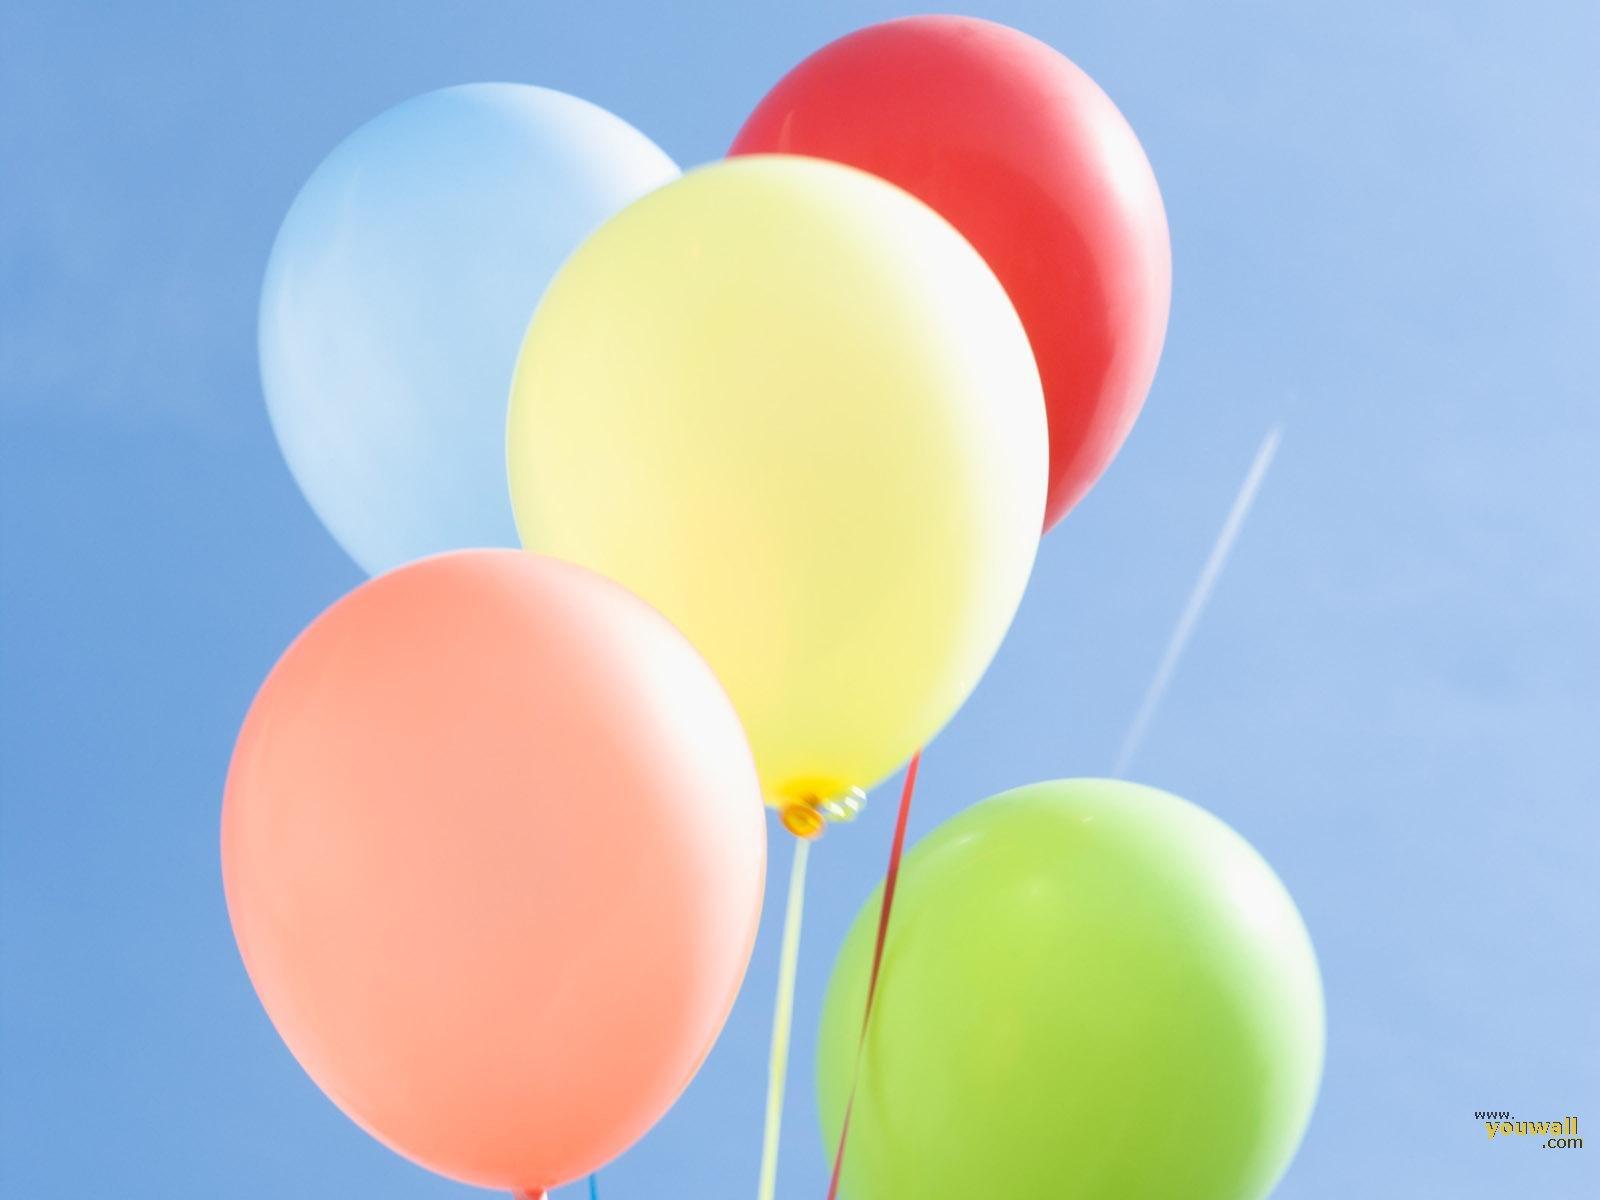 Balloons Wallpaper   wallpaperwallpapersfree wallpaperphotodesktop 1600x1200